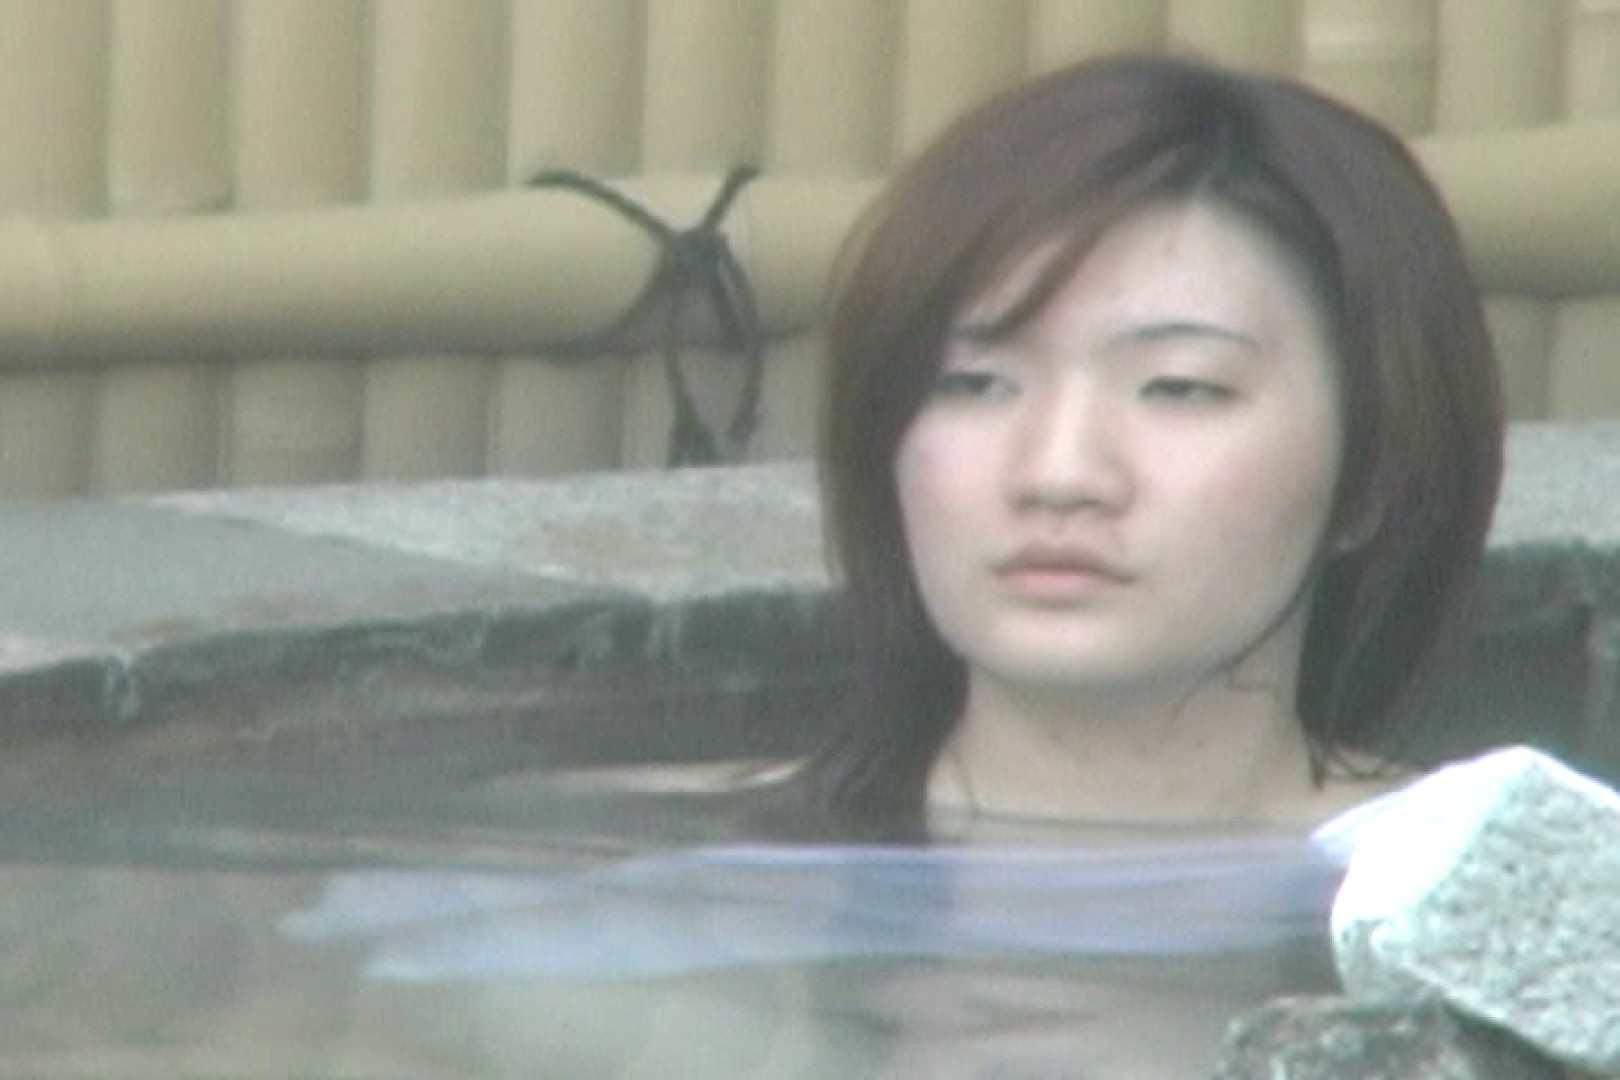 Aquaな露天風呂Vol.590 露天風呂突入 すけべAV動画紹介 76pic 41